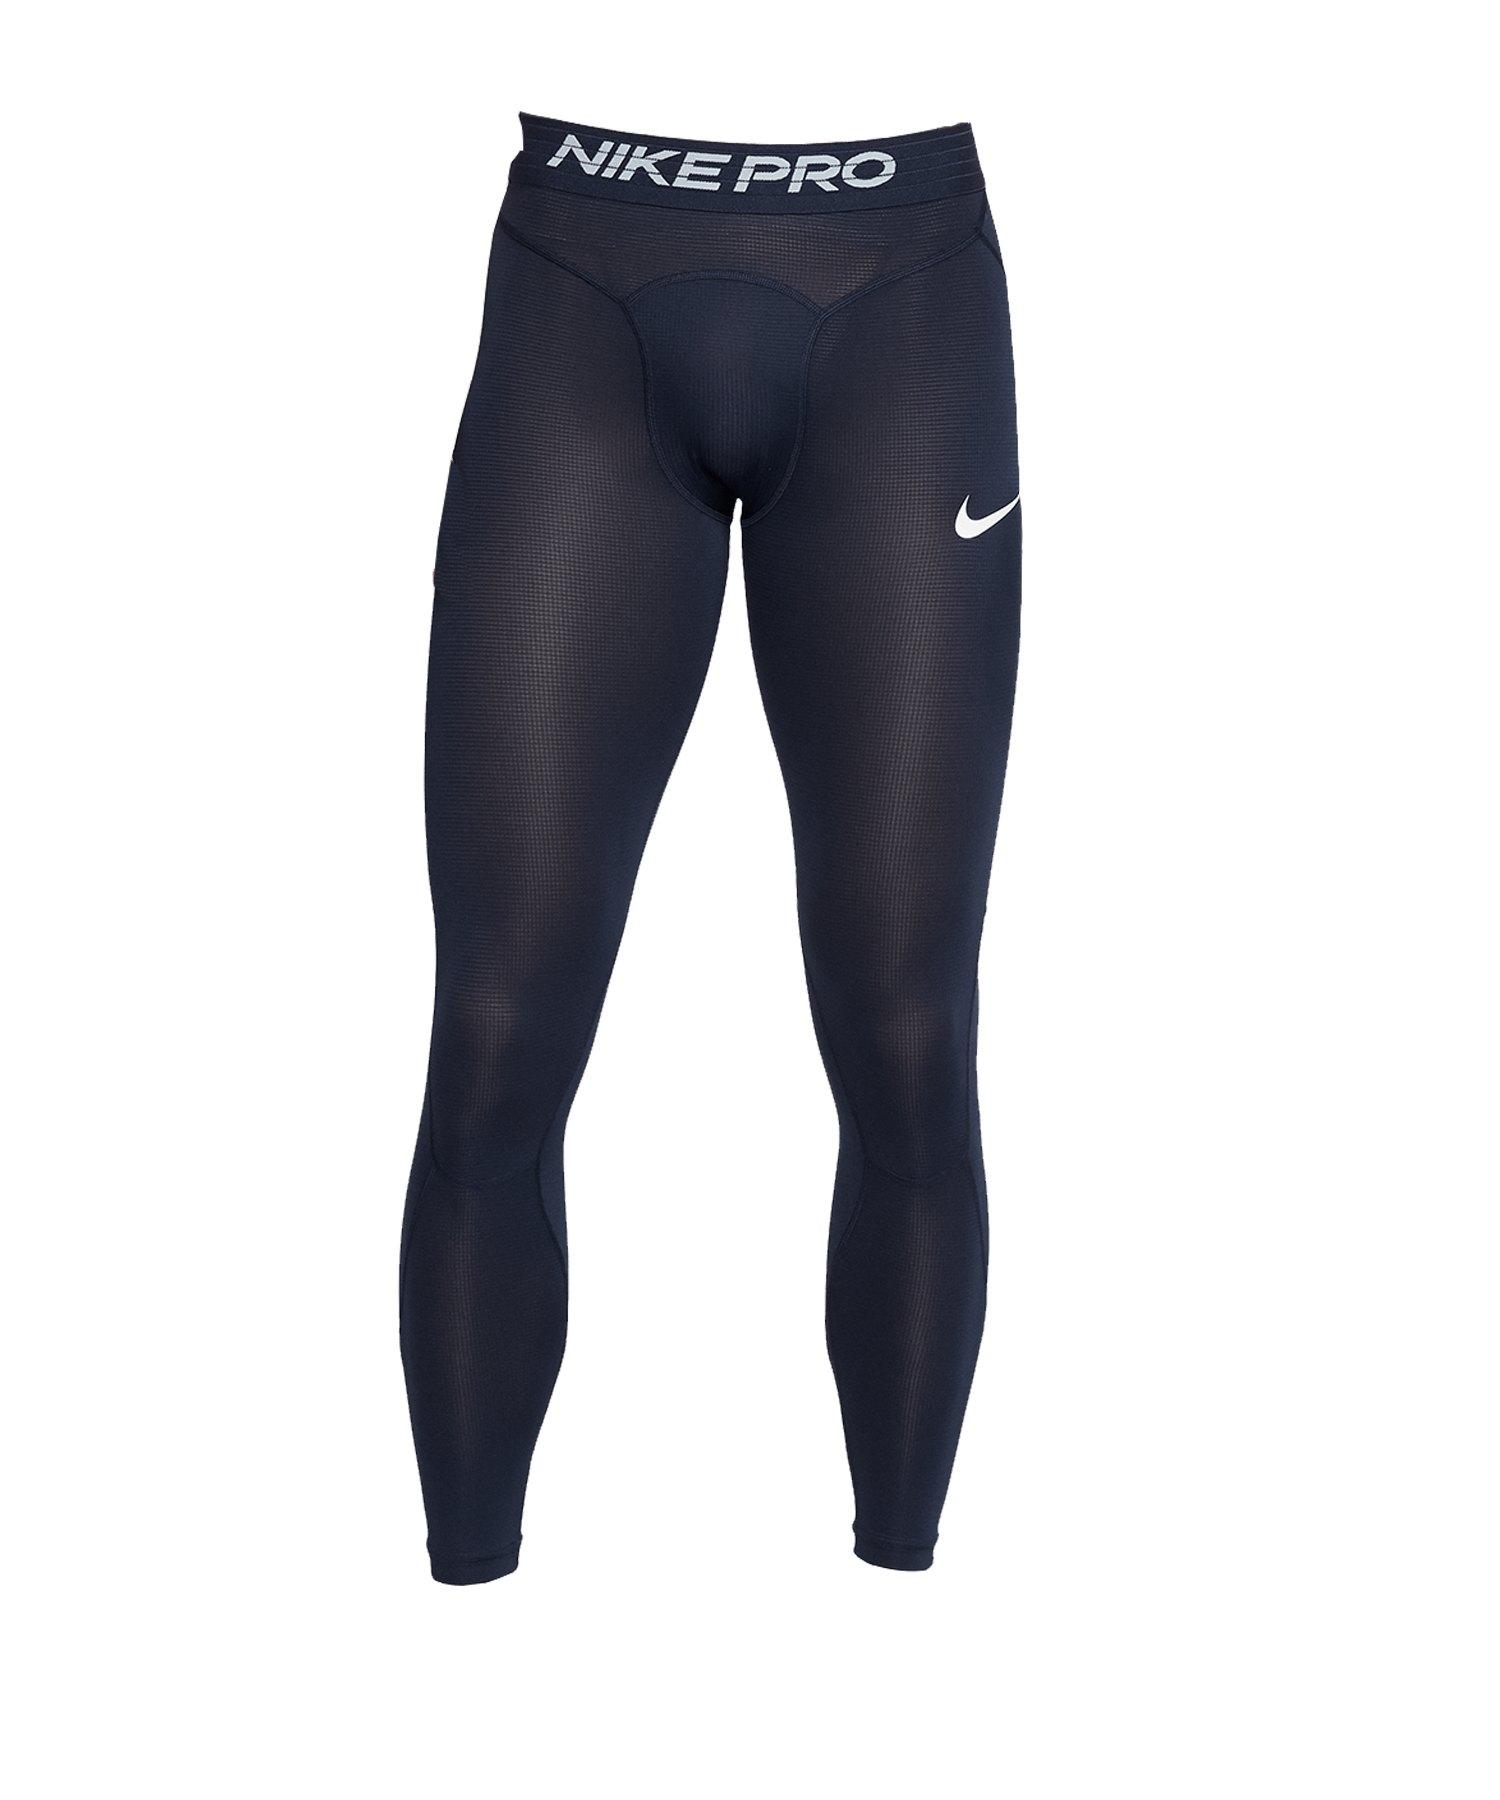 Nike Pro Breathe Tights Hose lang Blau F452 - blau